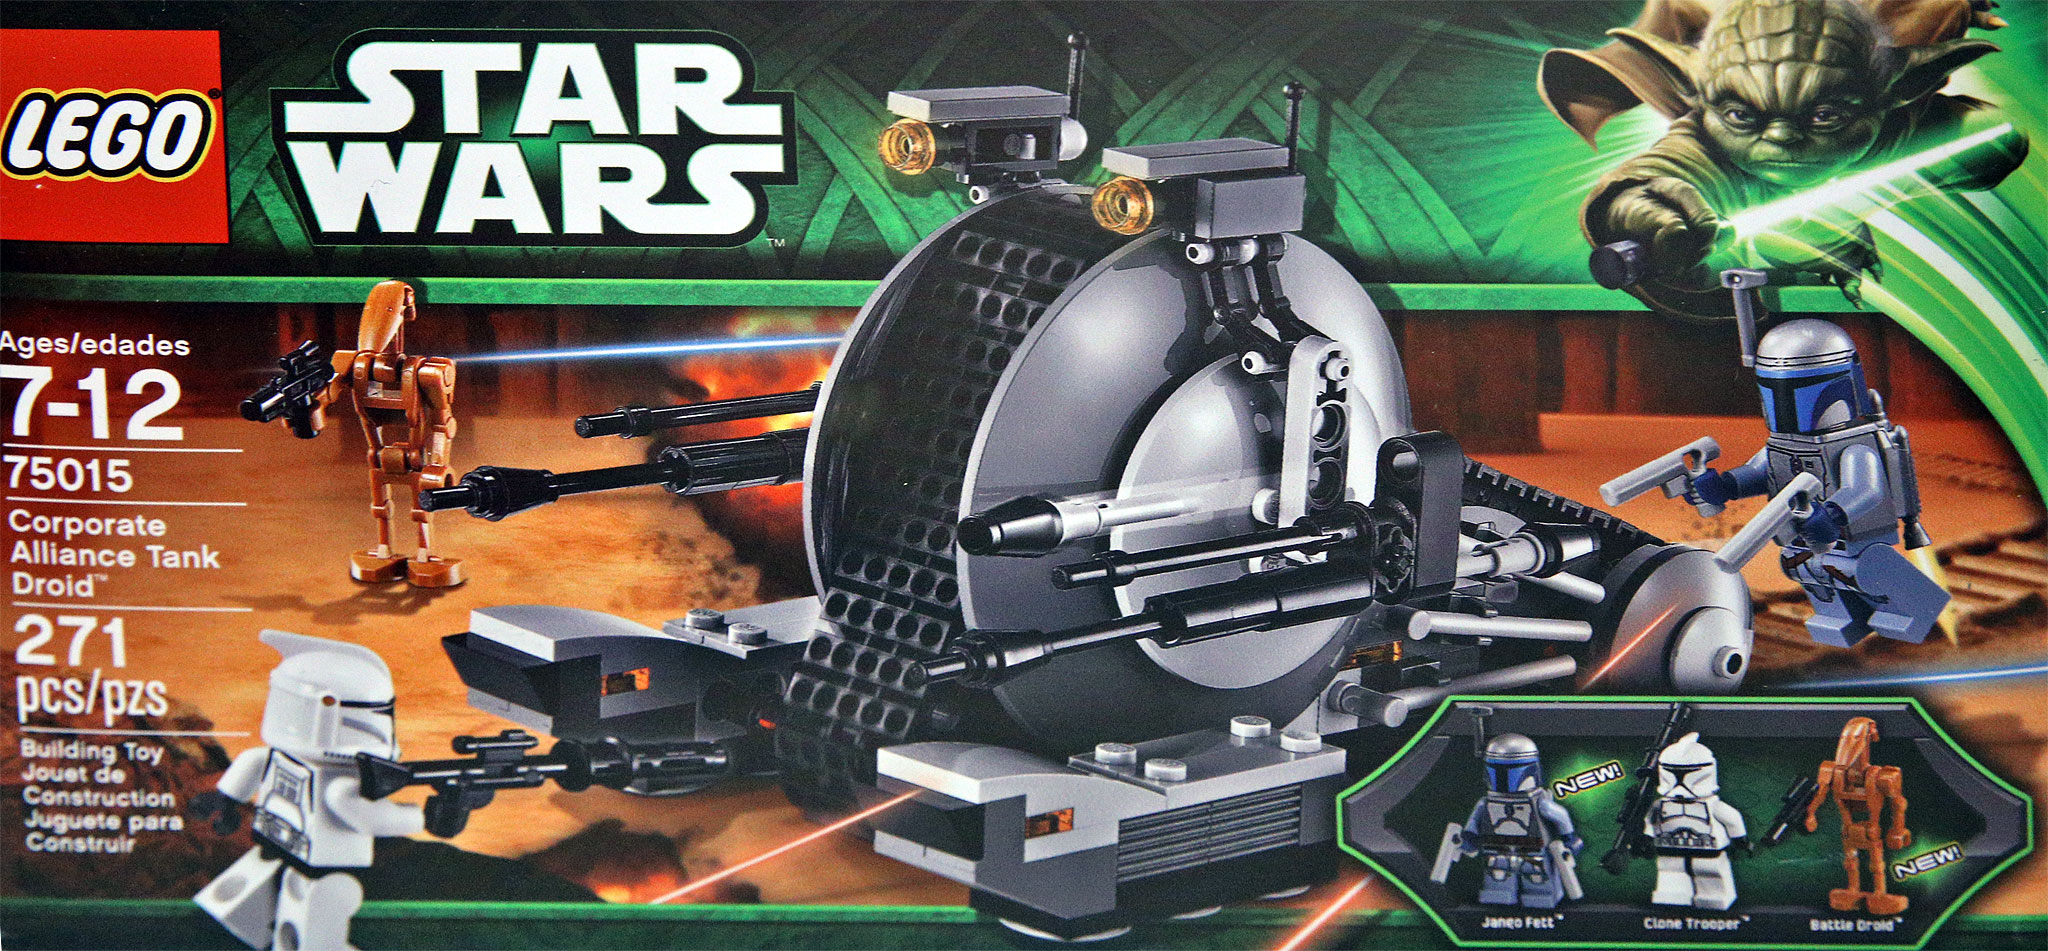 lego star wars  summer sets se list images corporate alliance tank droid